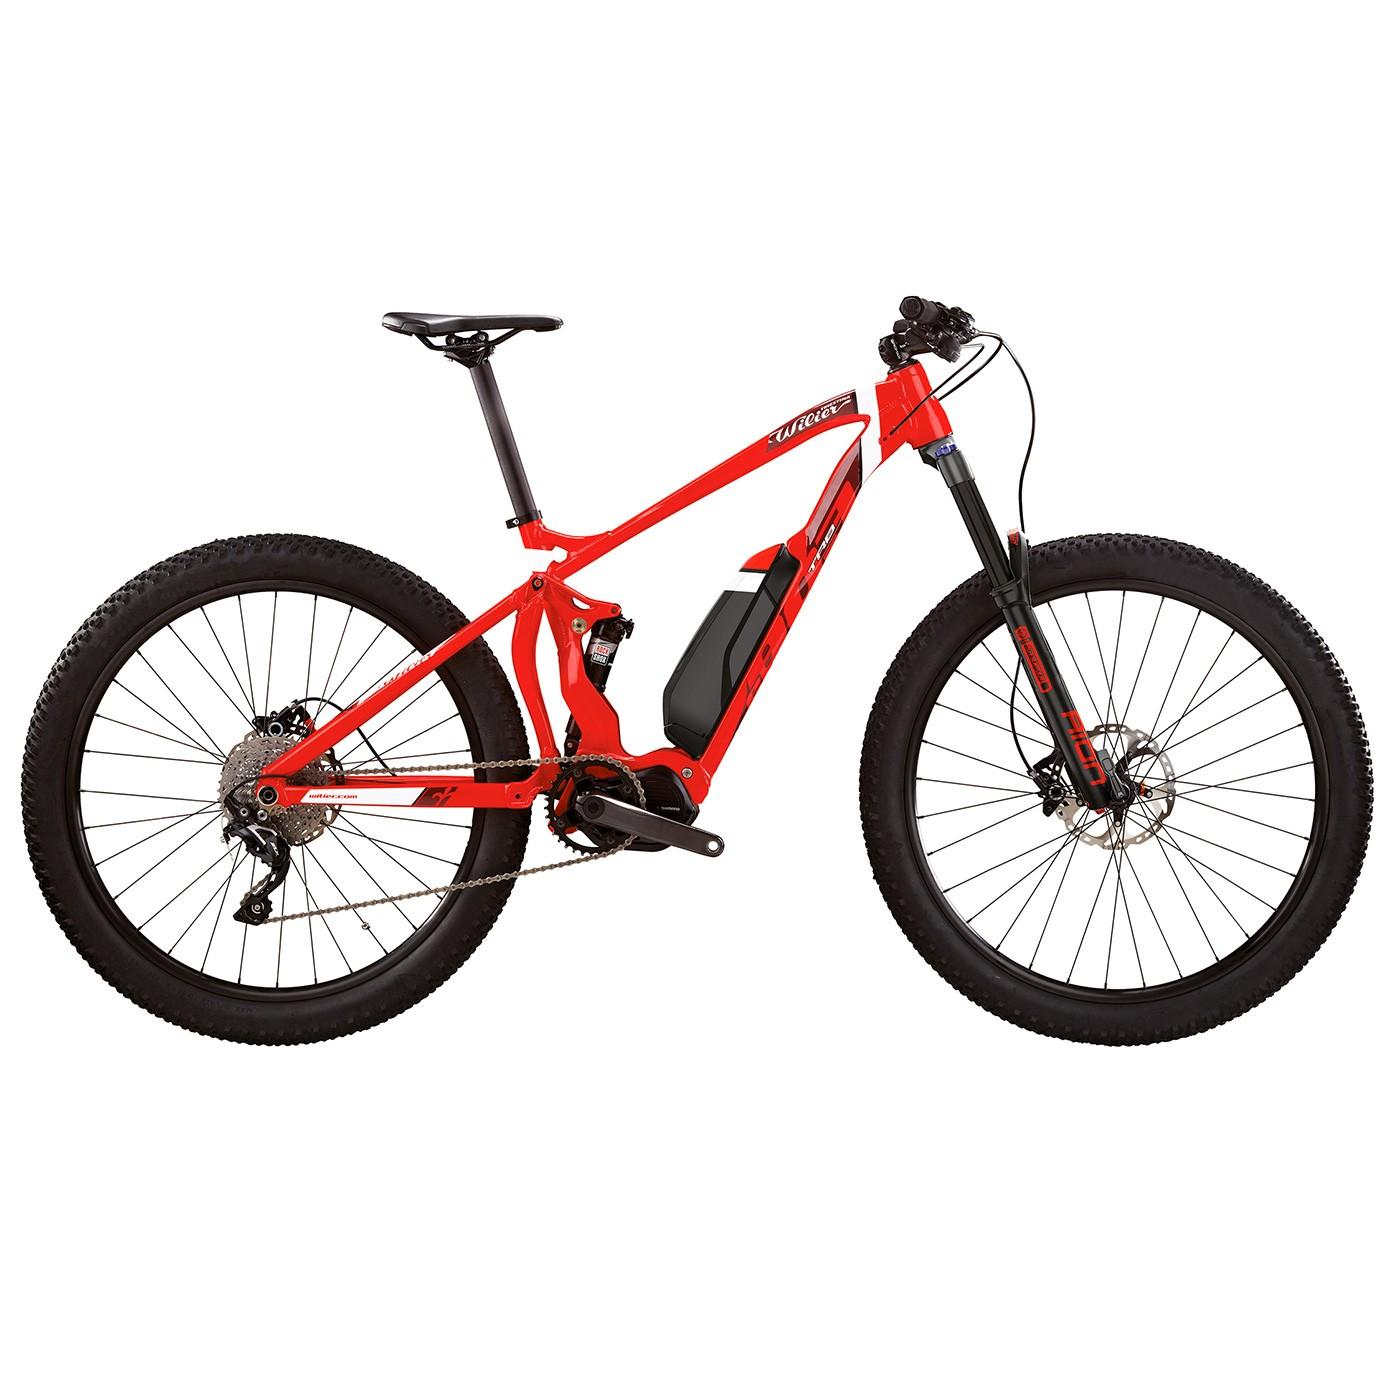 Comp 1x10 803 Bike Trb Blanc Wilier Triestina S Rouge Slx E 3K1cuFJTl